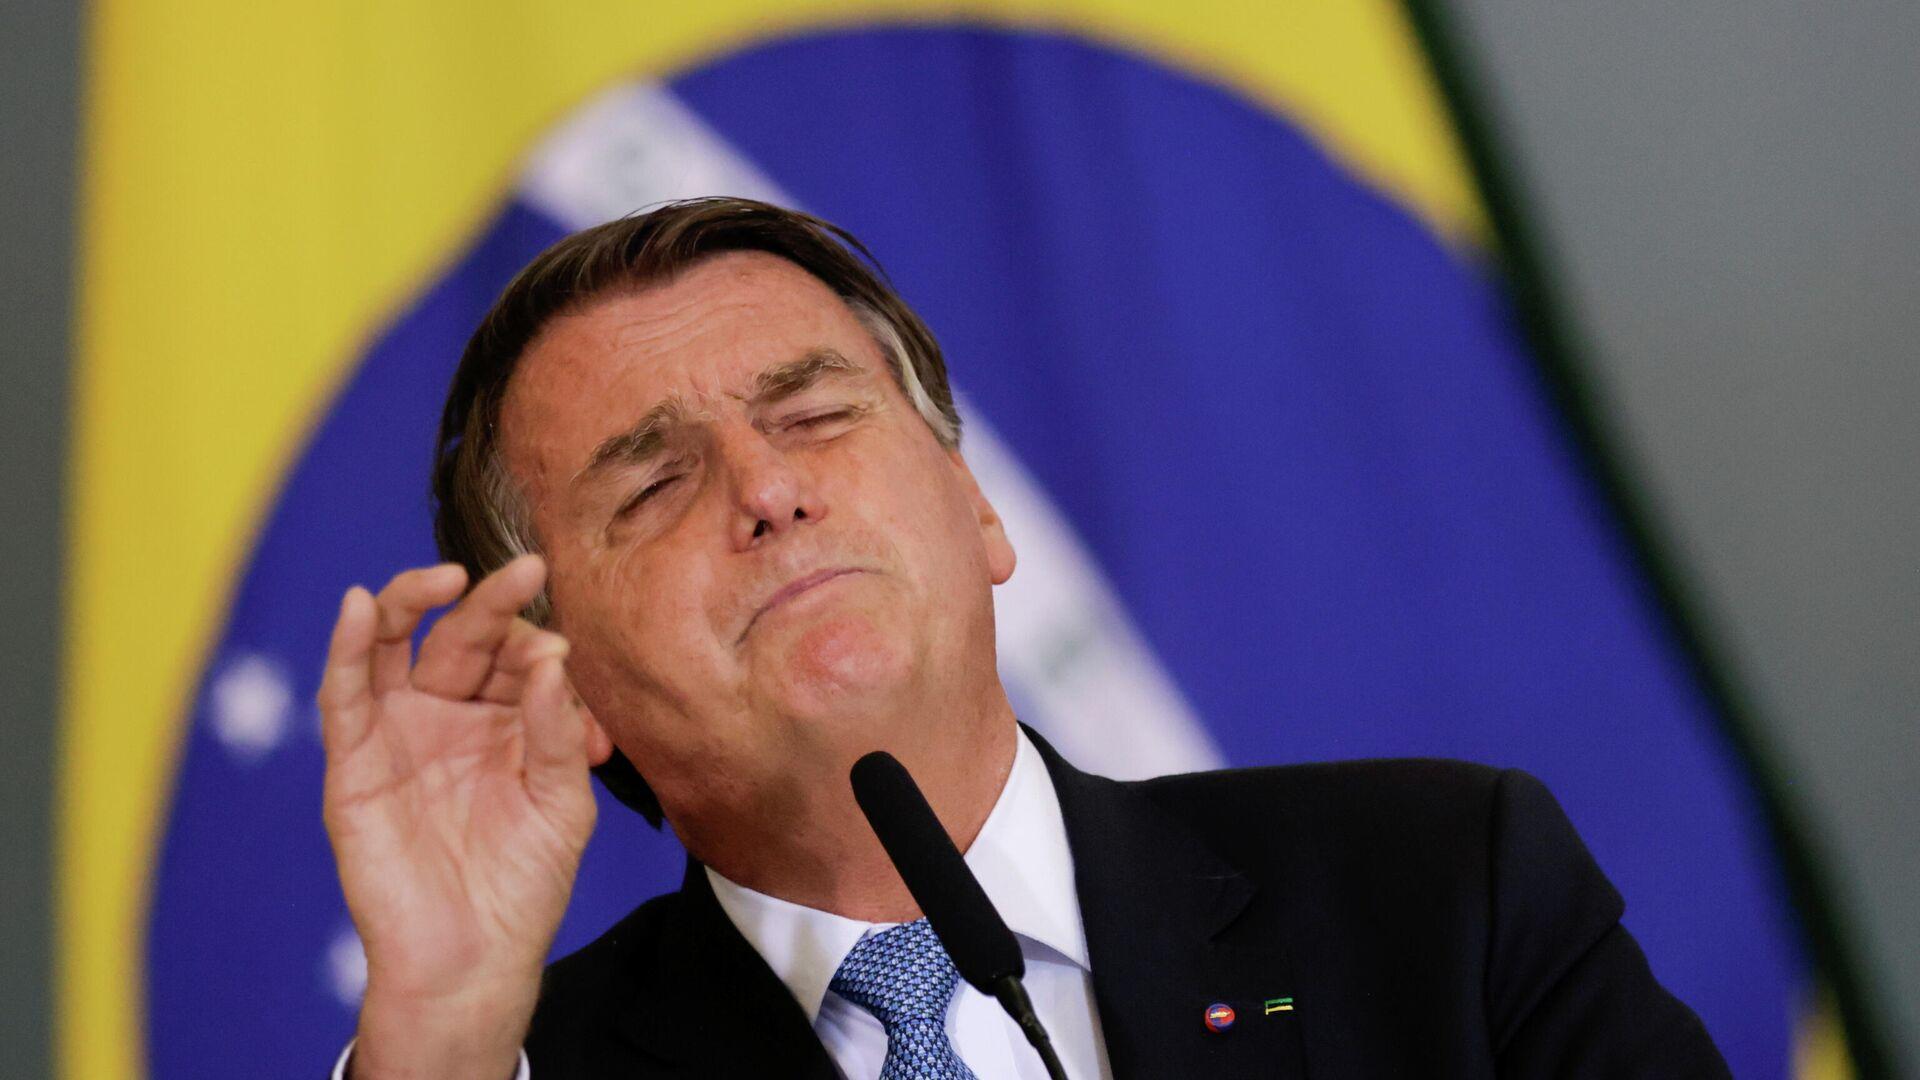 Jair Bolsonaro, presidente de Brasil - Sputnik Mundo, 1920, 07.10.2021